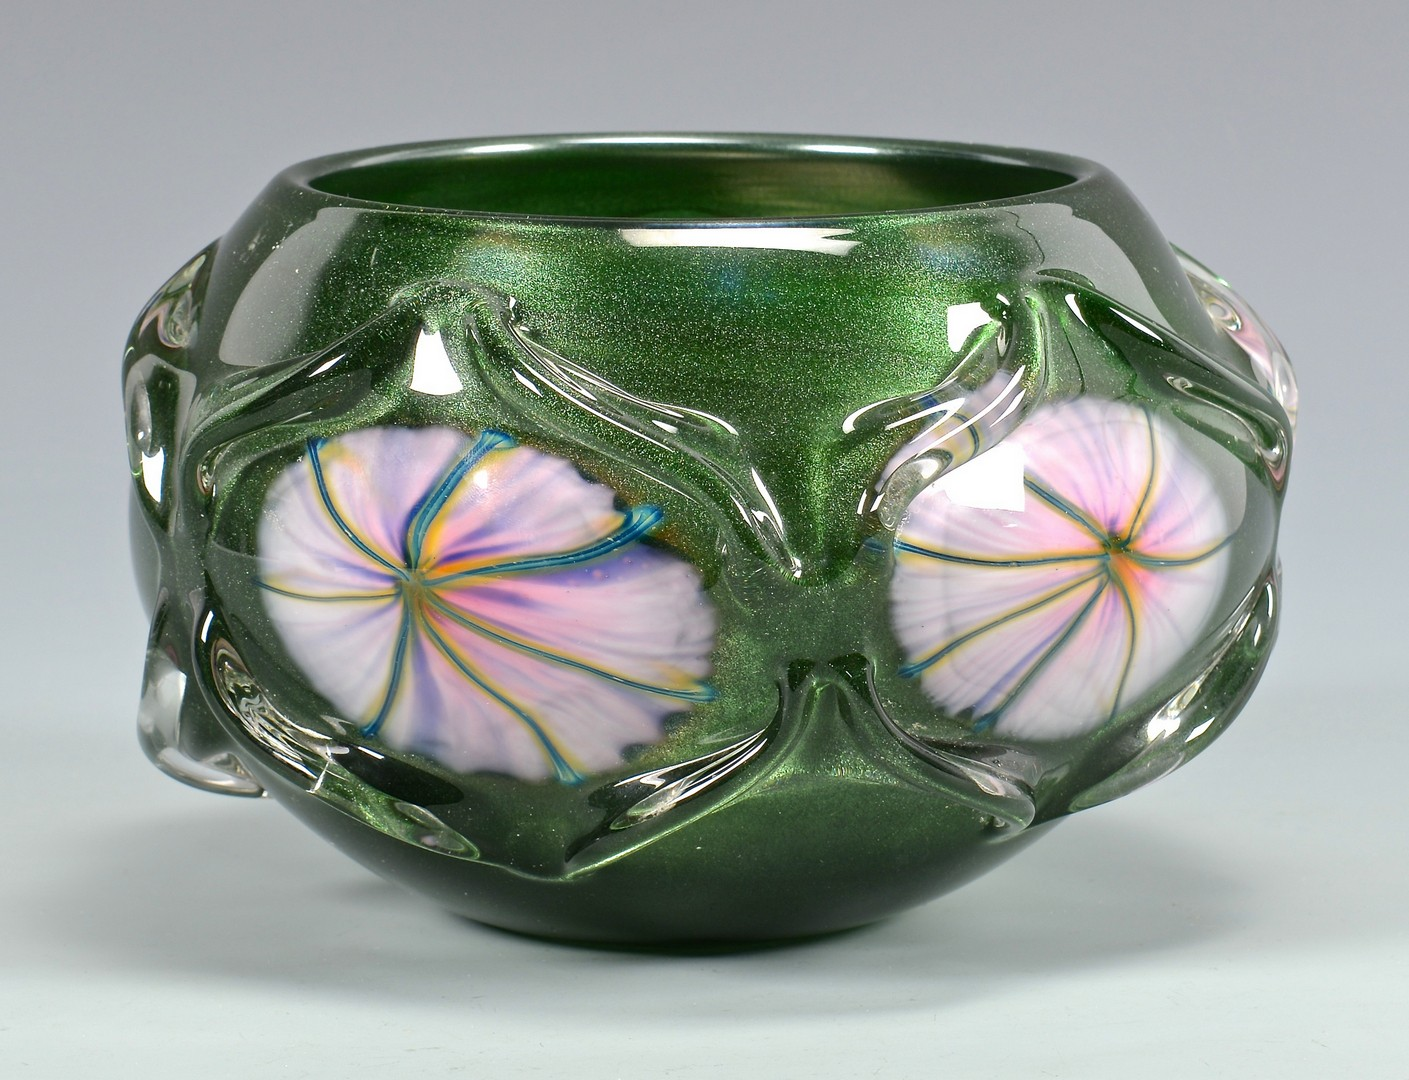 Lot 455: Charles Lotton Multiflora Bowl